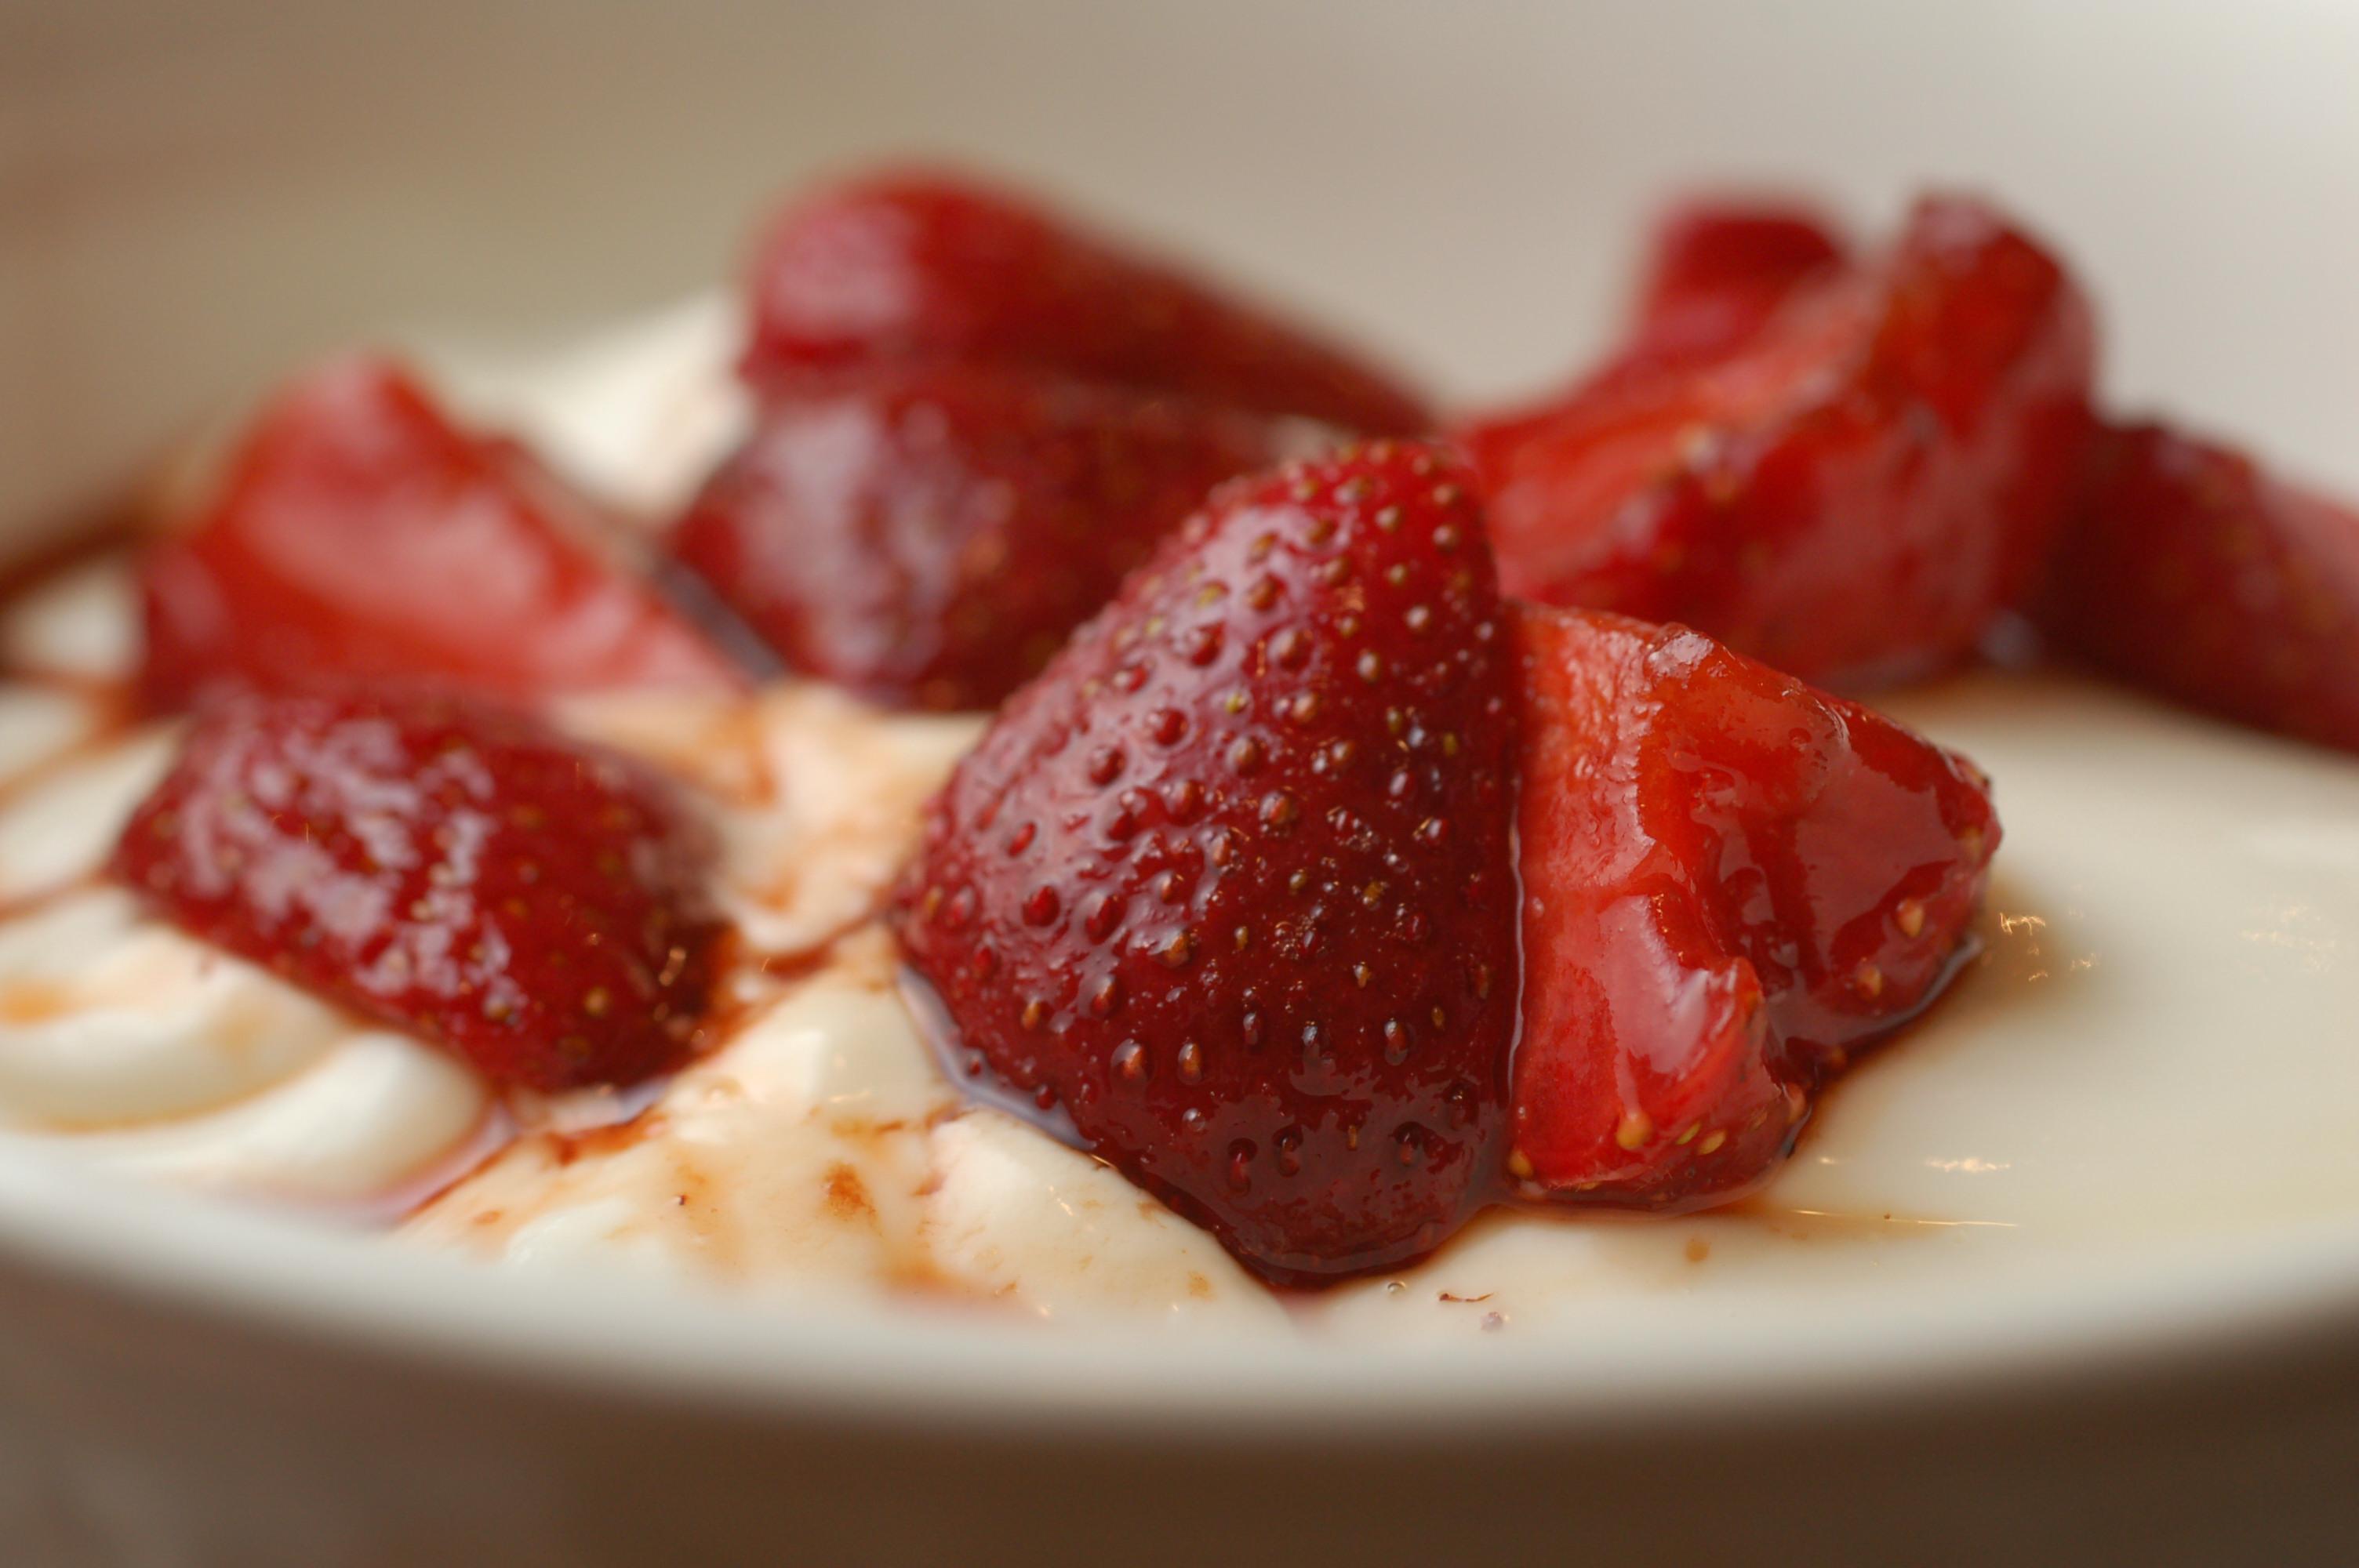 kitchenography: amanda hesser's yogurt panna cotta with